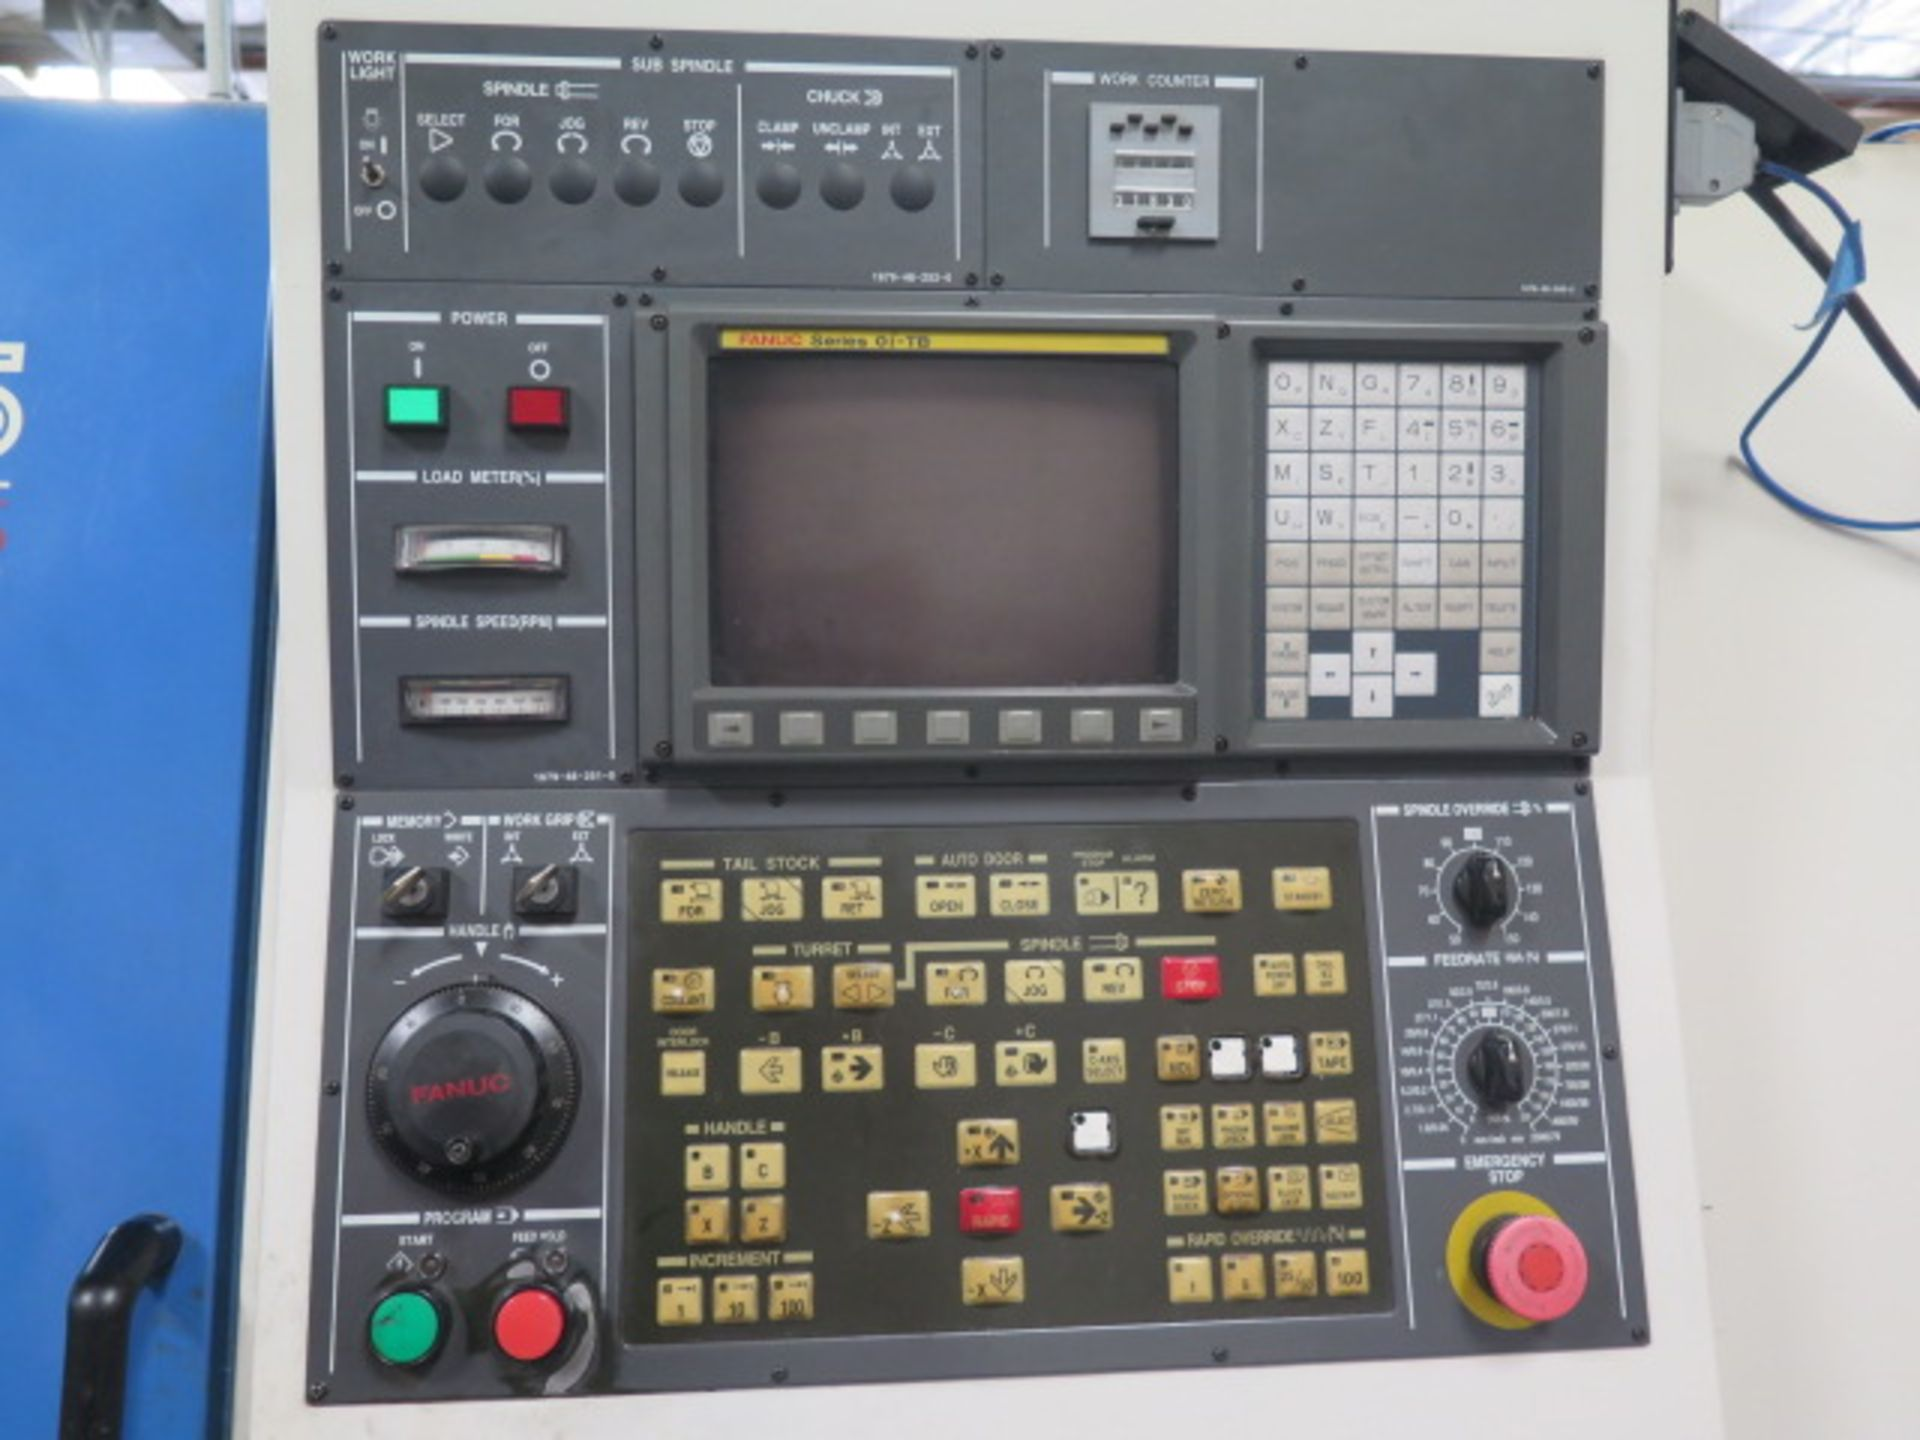 2004 Kia Super KIA Turn 15 CNC Turning Center s/n SKT150905 w/ Fanuc Series 0i-TB Contrs, SOLD AS IS - Image 5 of 16